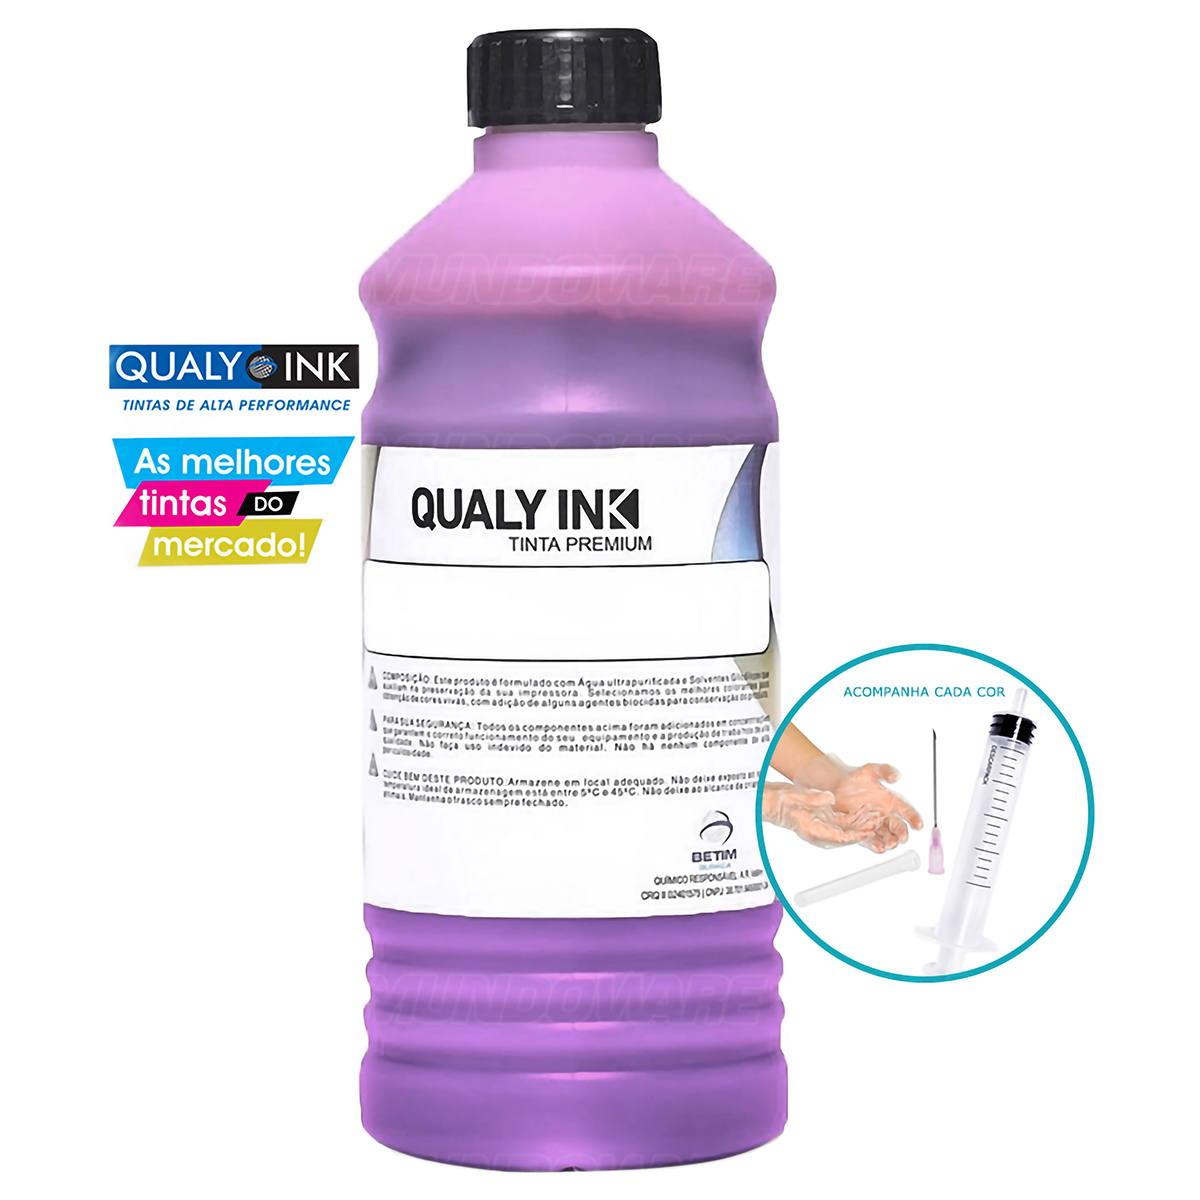 Compatível: Tinta Pigmentada Qualy-Ink LMP3E-1549 Série 673 para Epson L800 L805 L810 L850 L1800 Magenta Light 1L